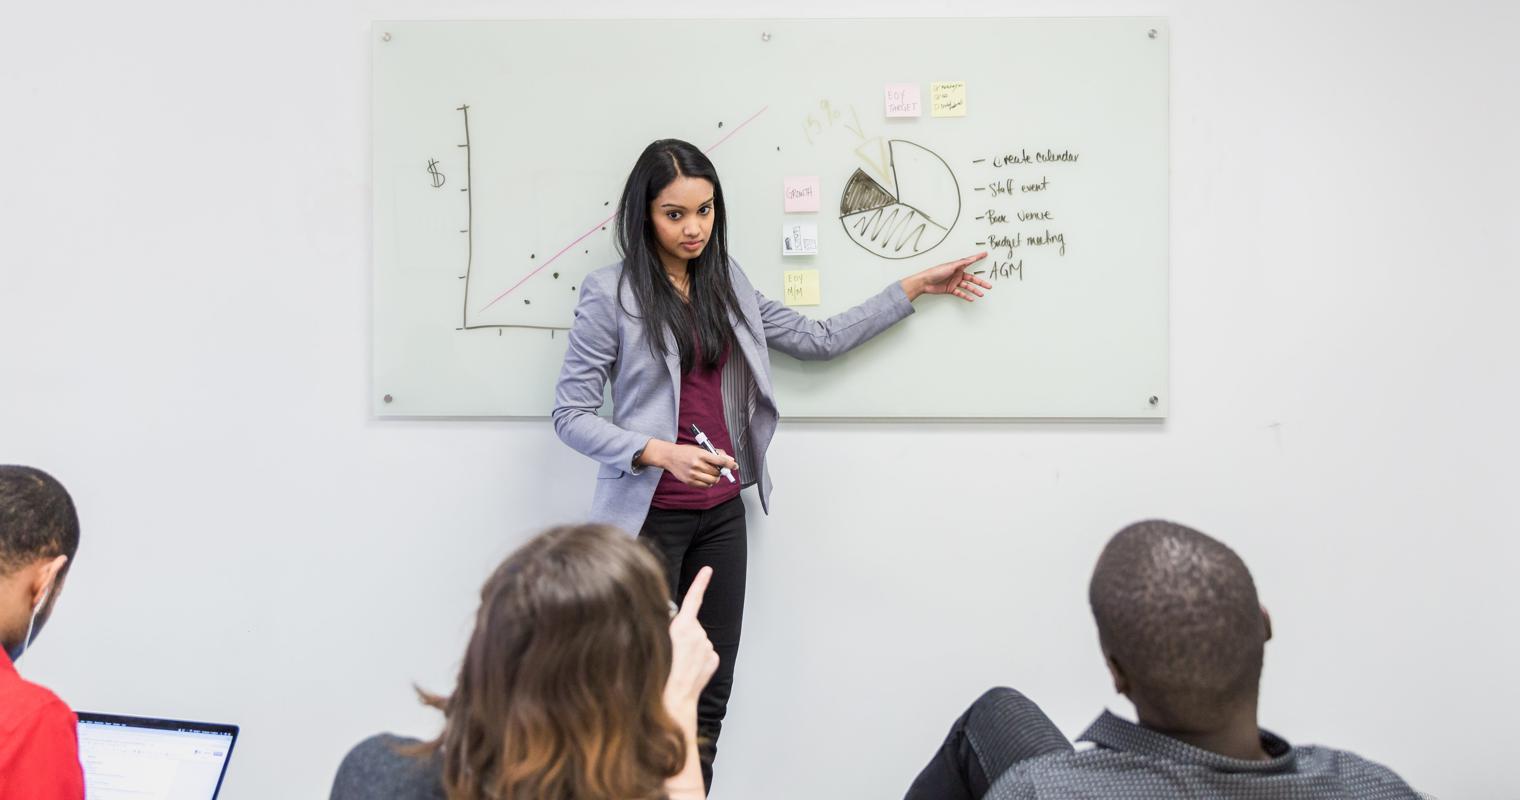 Summer 2021 Internships: Virtual, Hybrid, or In-Person?